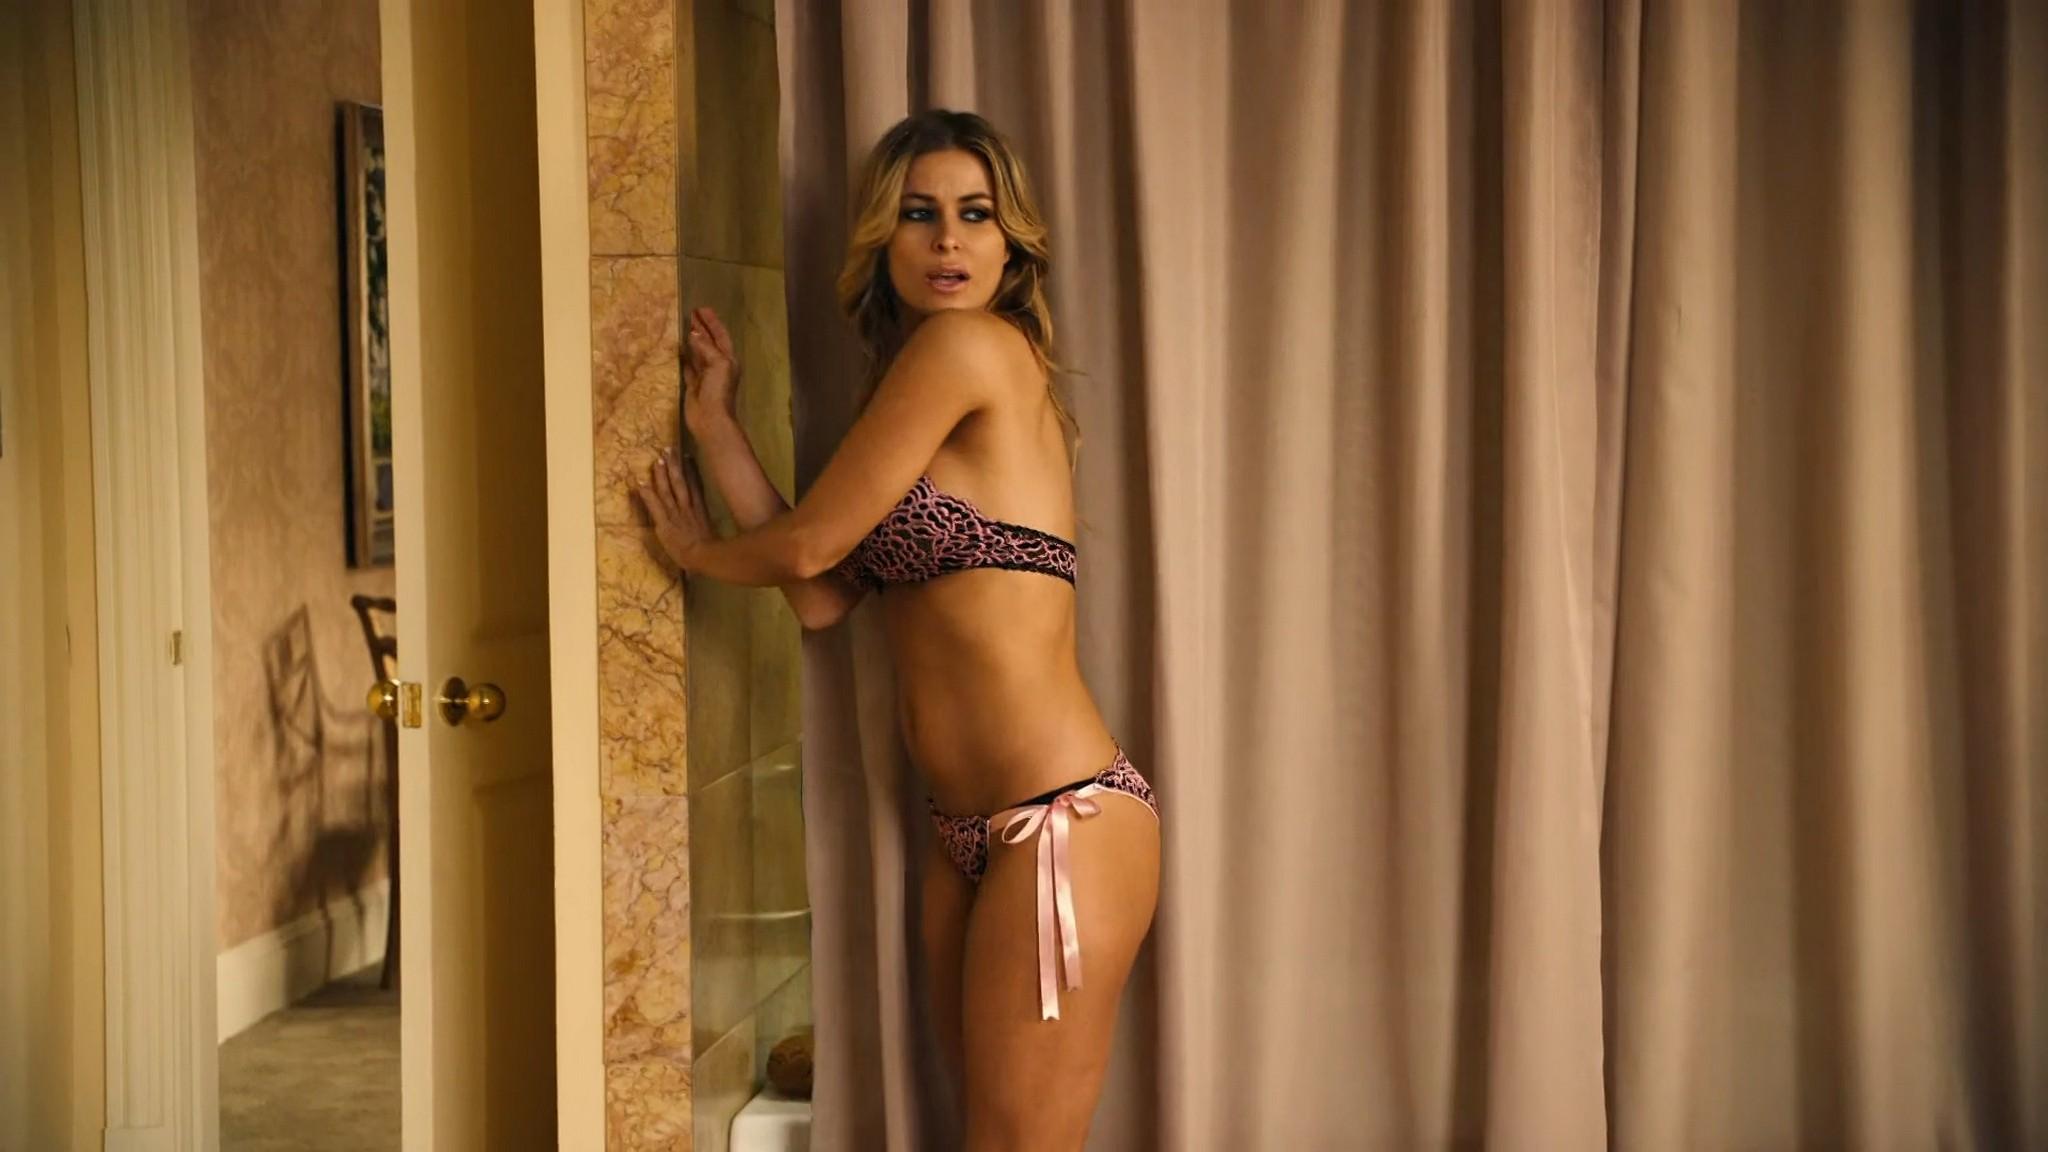 Danneel Ackles nude Carmen Electra, Arielle Kebbel, sexy otherrs nude and hot - Mardi Gras: Spring Break (2011) HD 1080p WEb (23)